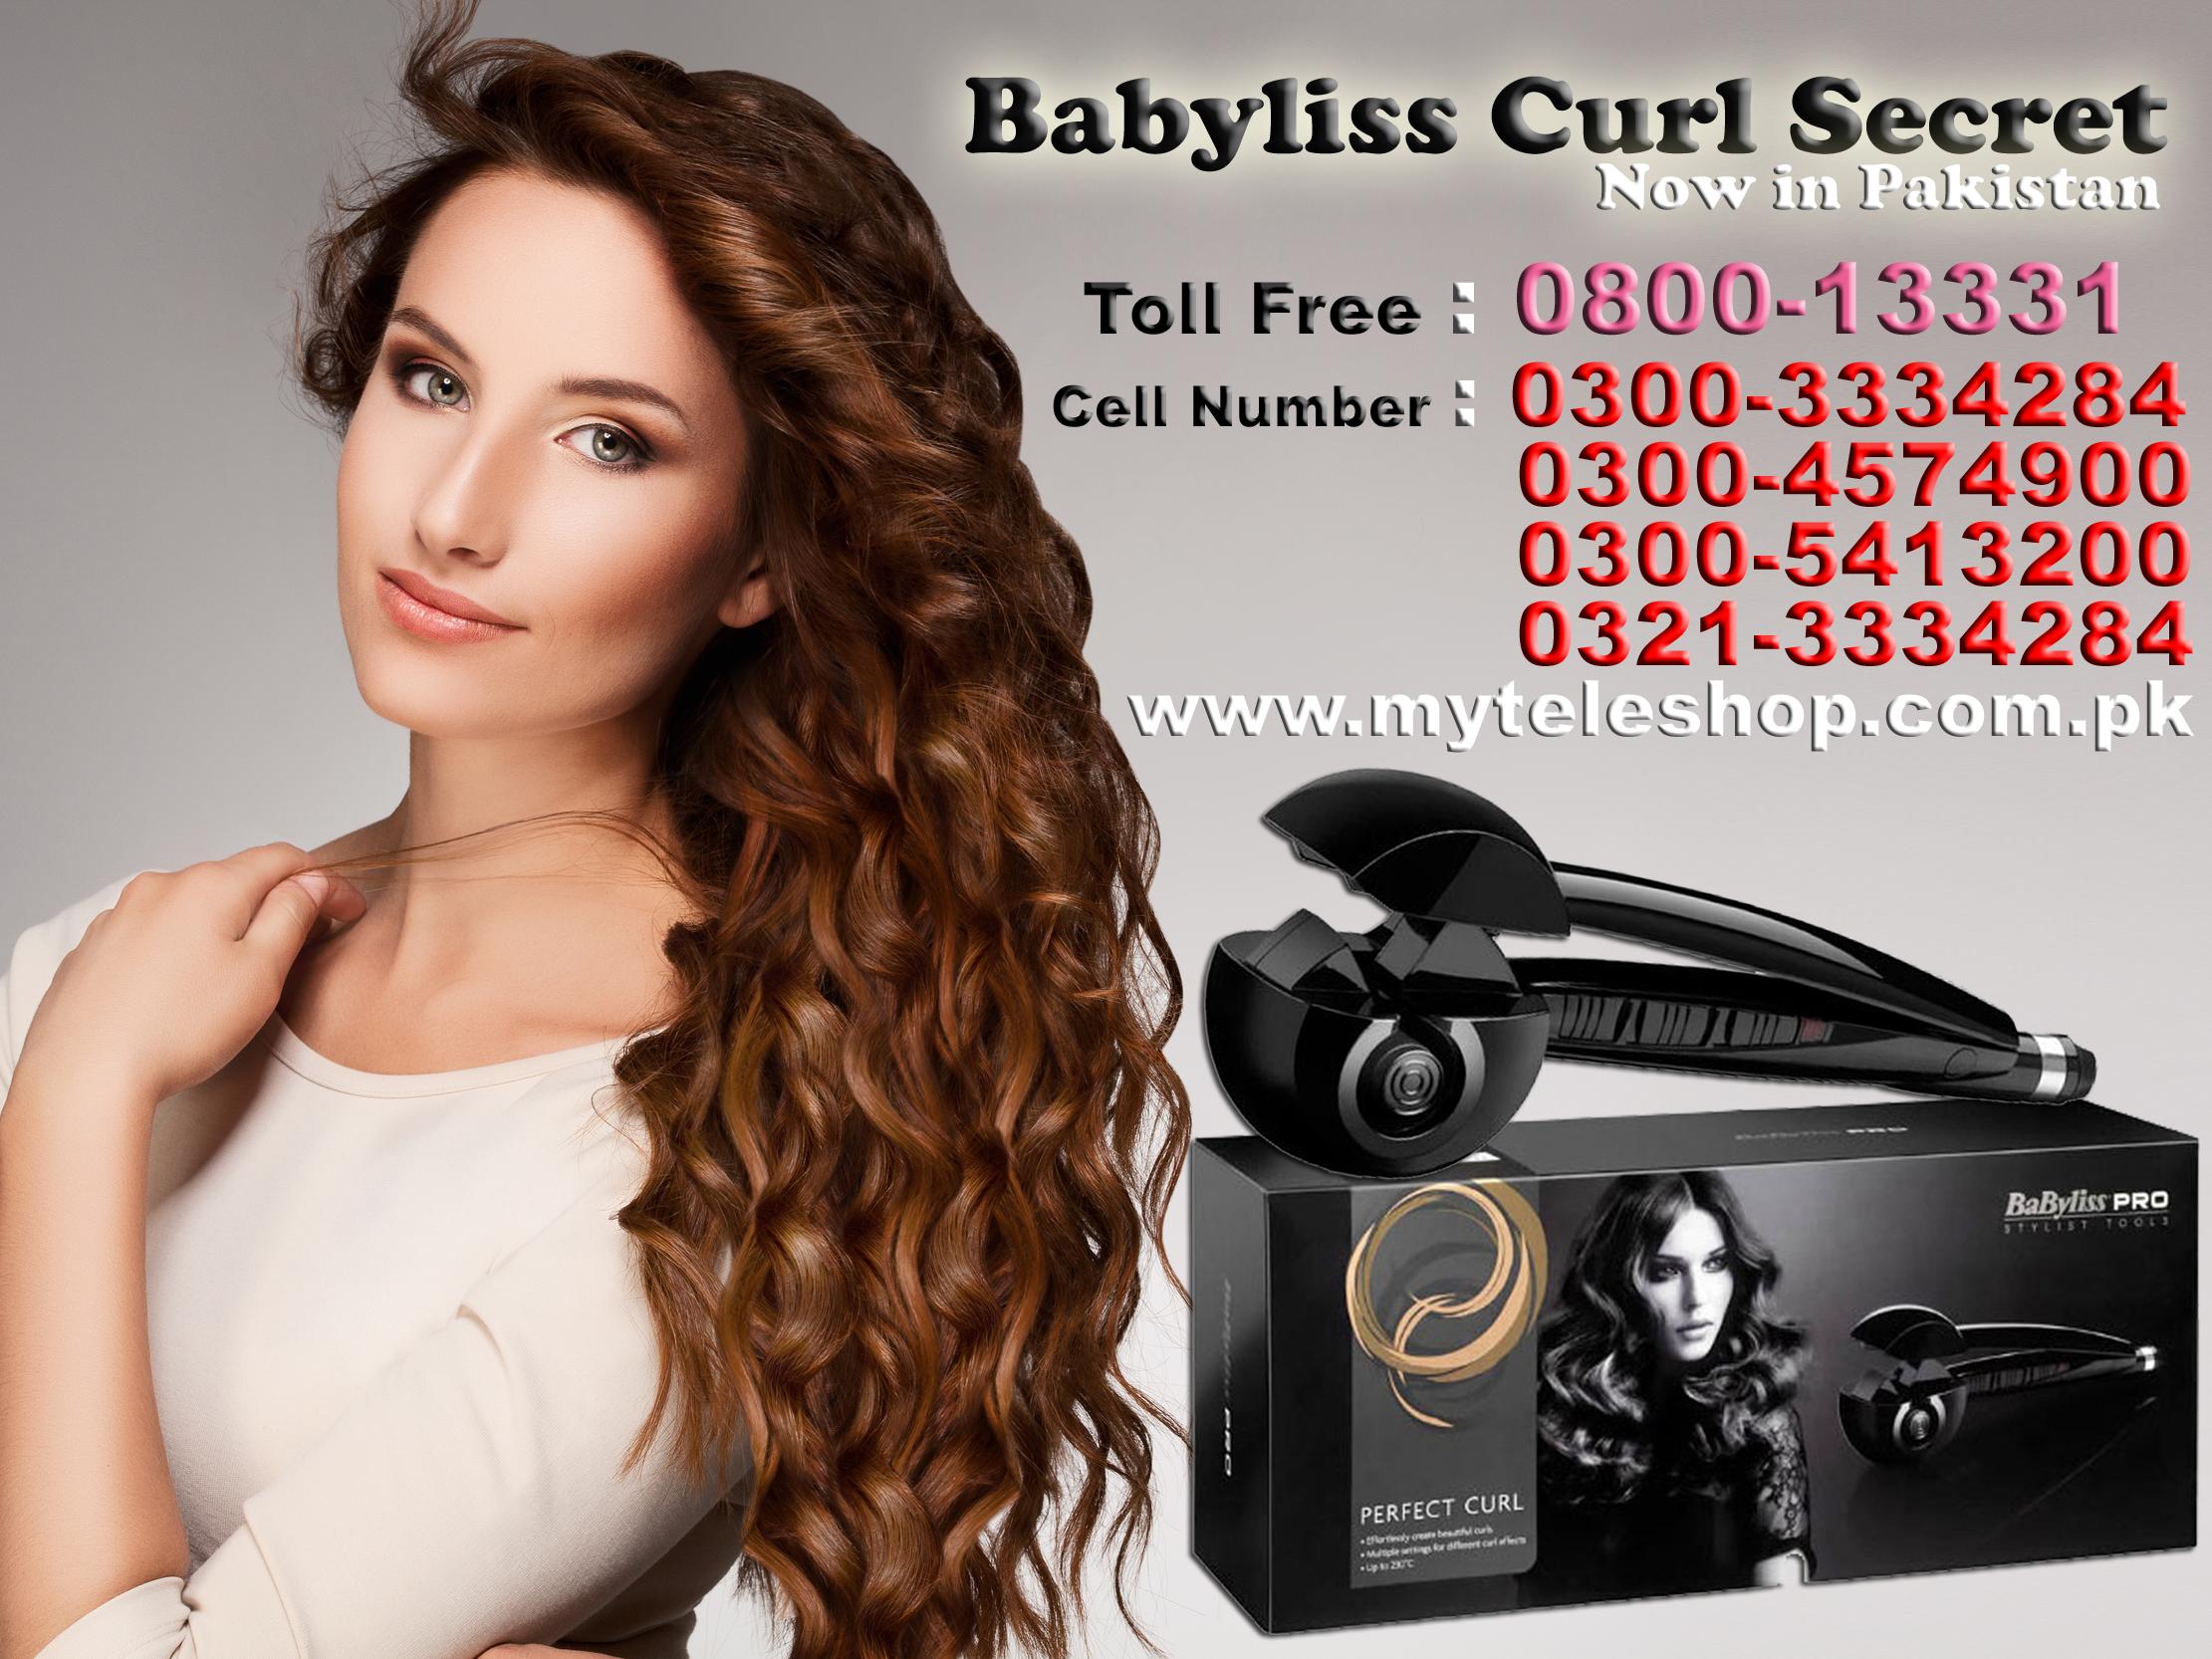 krøllejern babyliss perfect curl